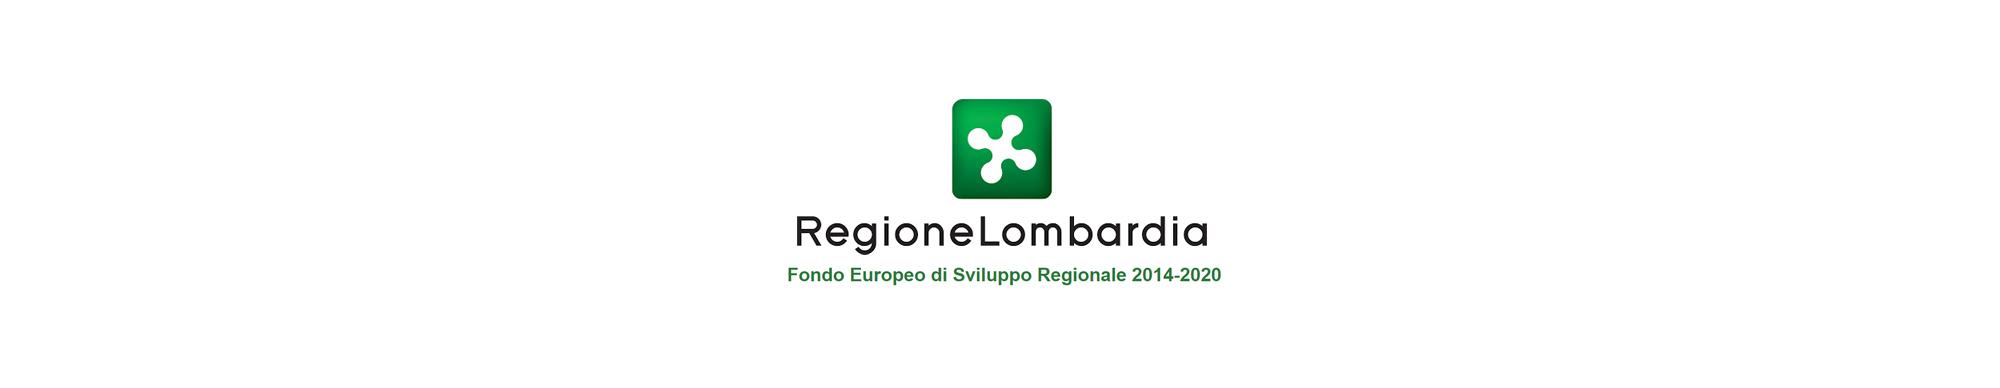 regione-lombardia-fashiontech-4